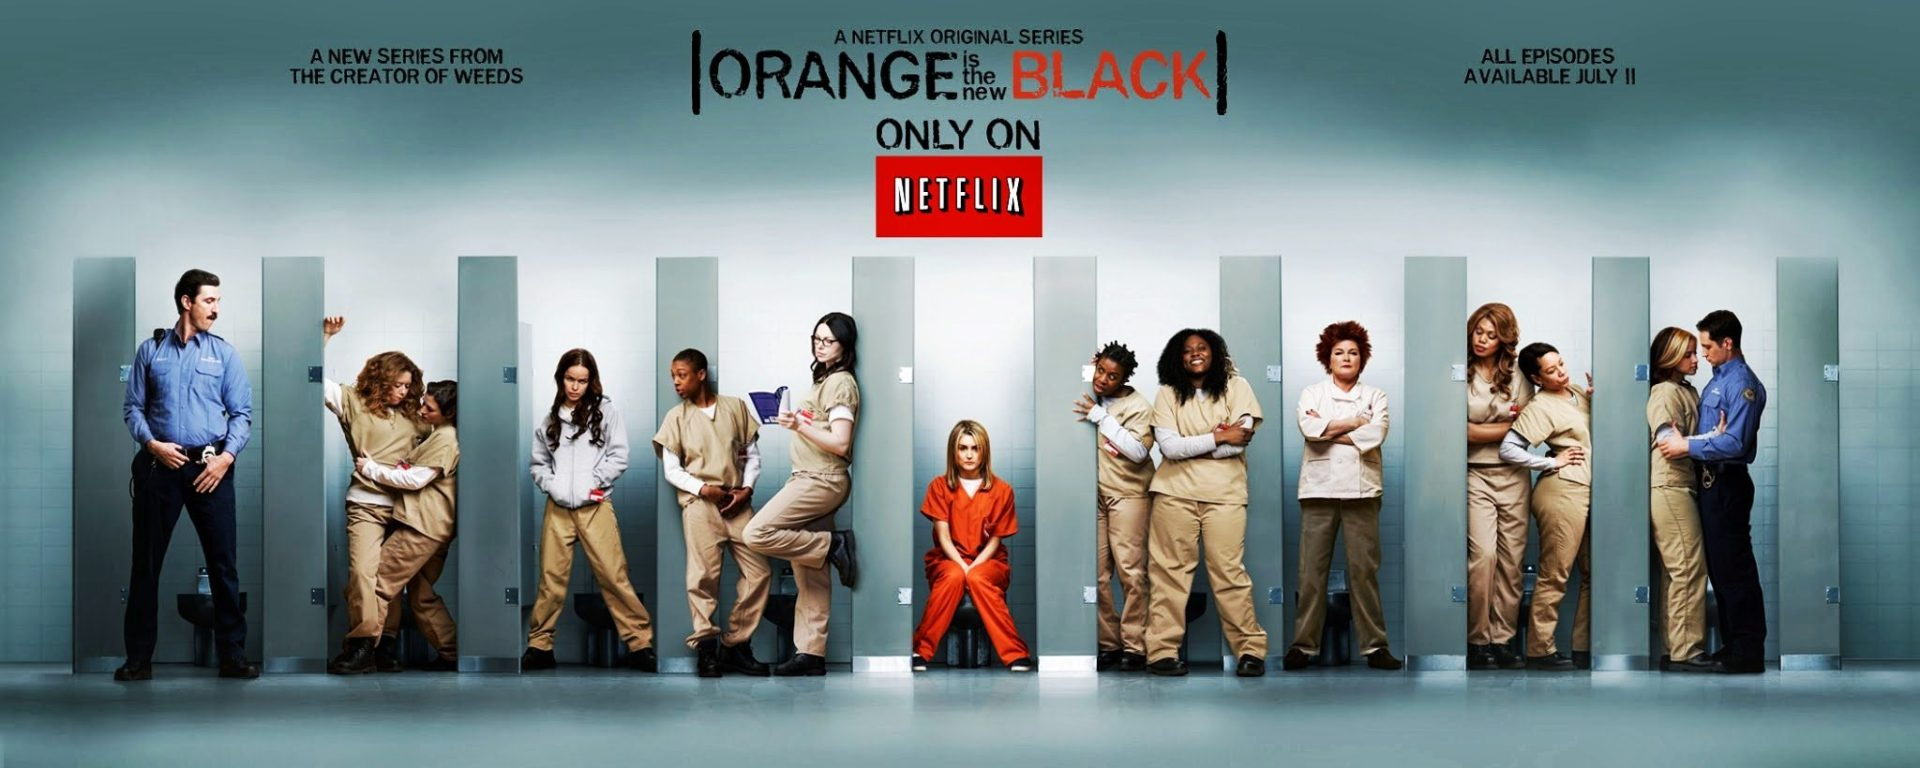 Orange is the New Black (Season 1 and 2) Review – Meera's Blog  Orange is the N...